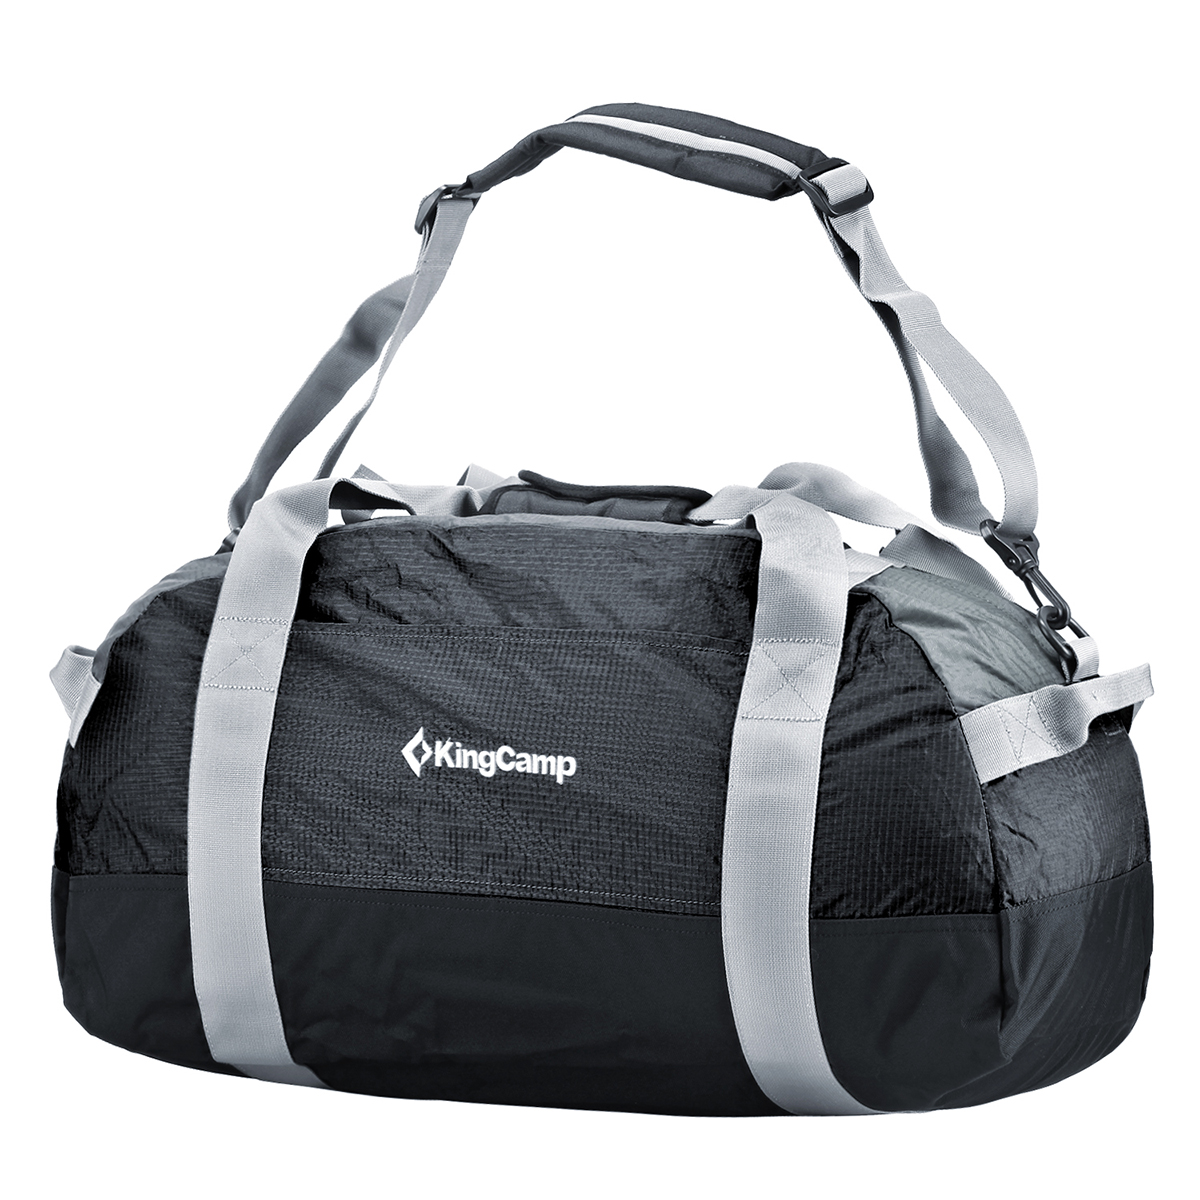 Сумка-баул для путешествий AIRPORTER, цвет: черный. 120 л kingcamp 4291 airporter